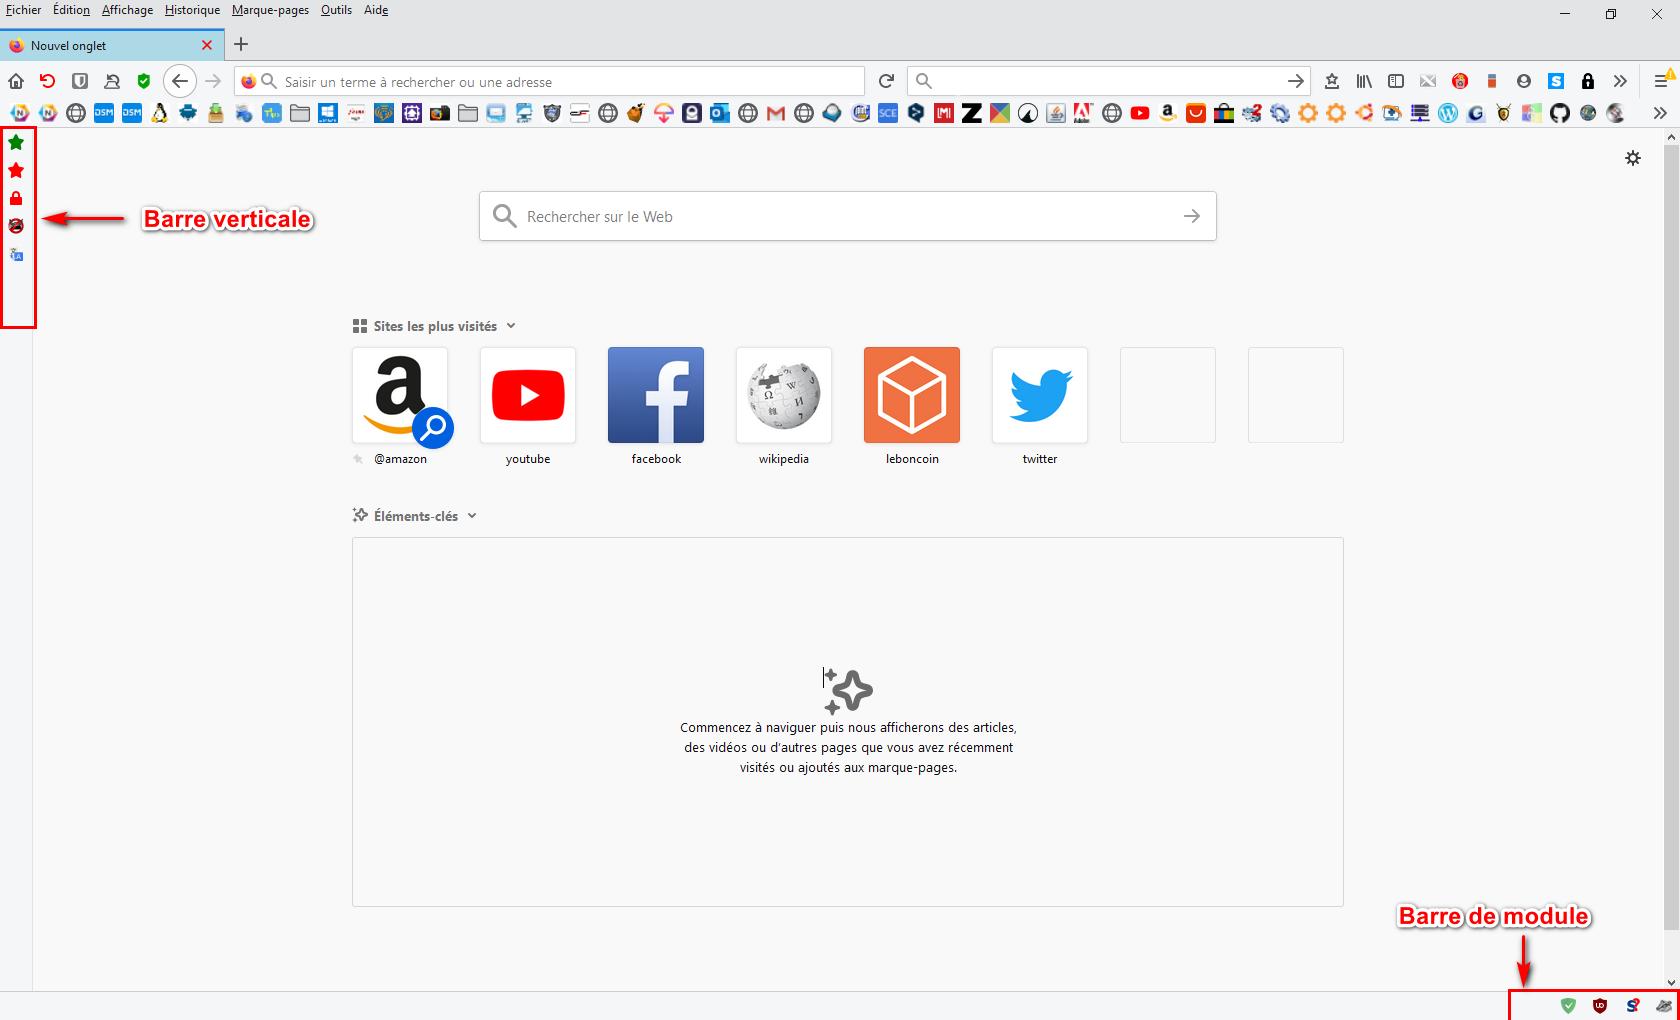 Firefox 70 avec barre module et barre verticale